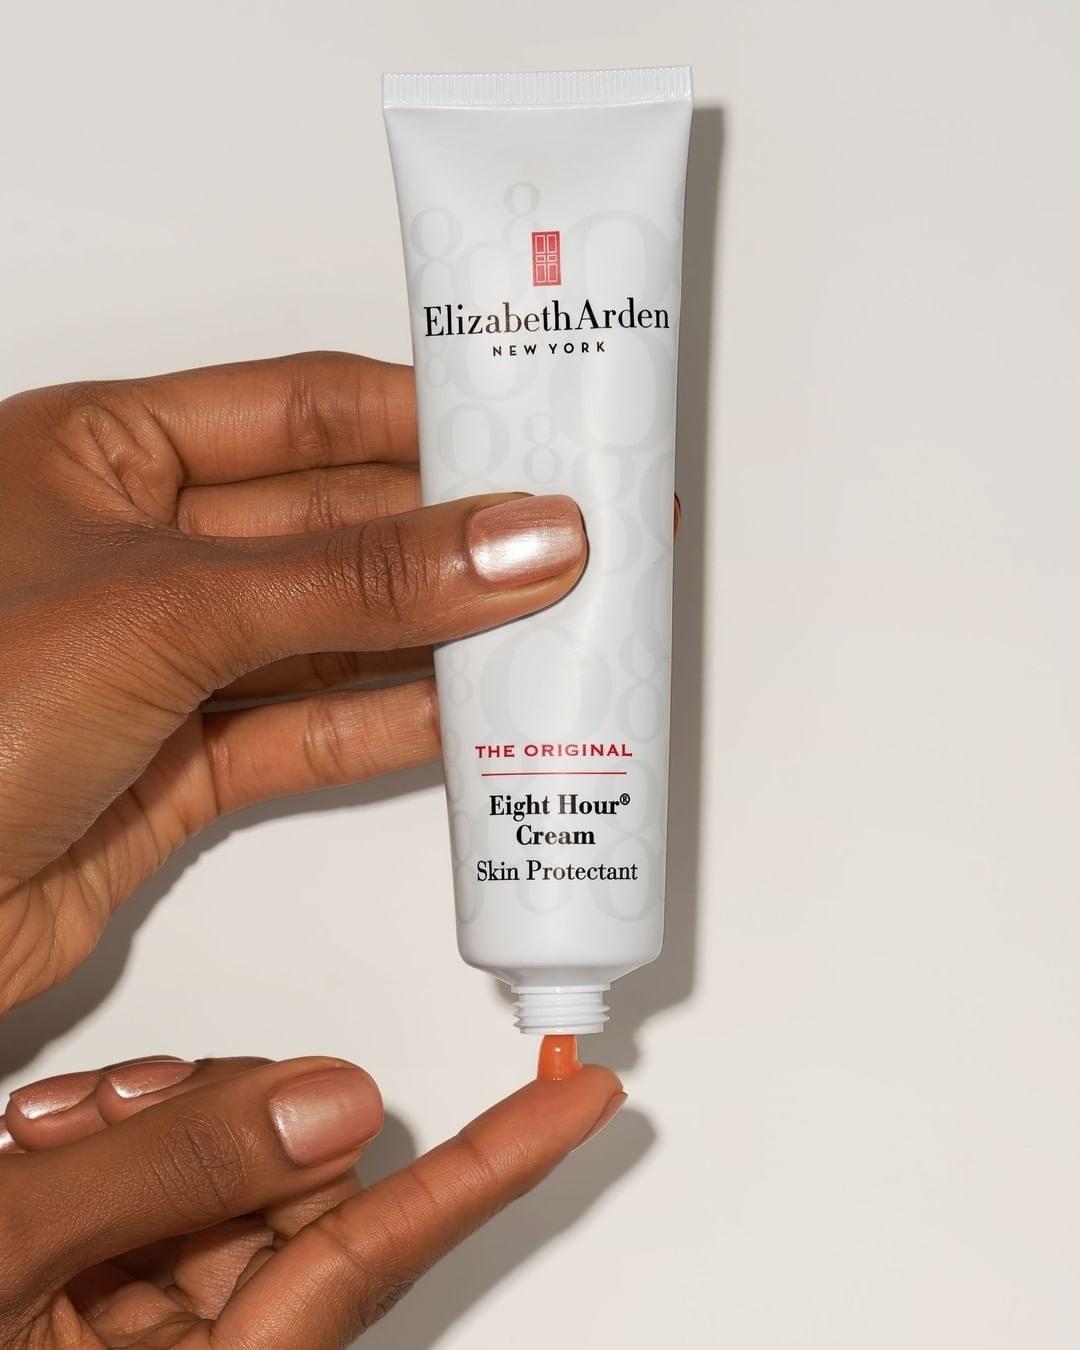 Model applying Elizabeth Arden Eight Hour Cream to fingertip